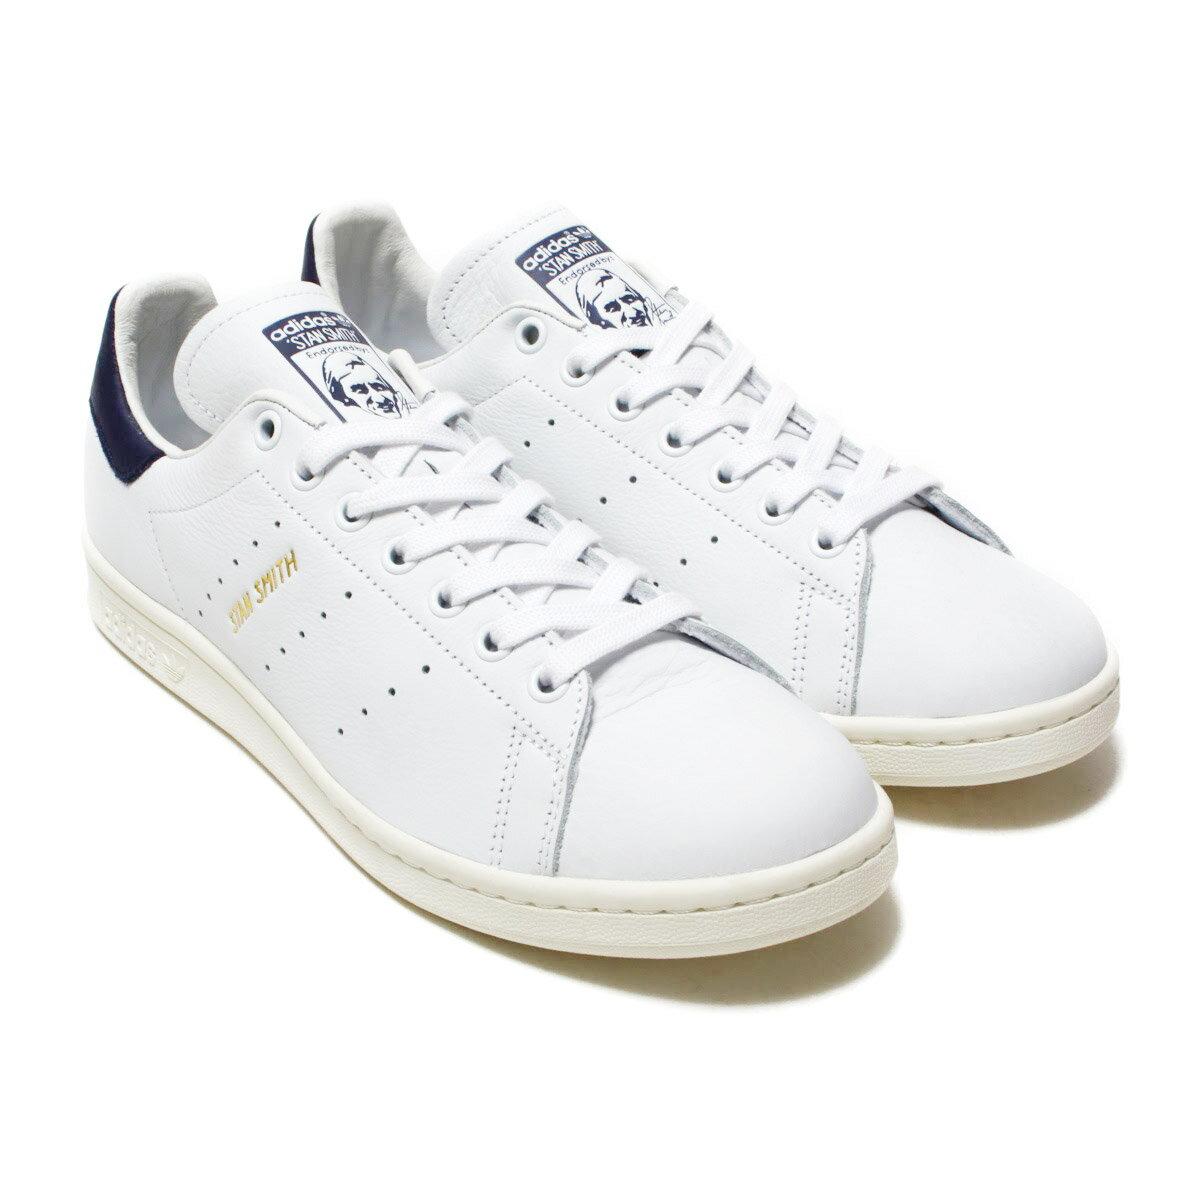 adidas Originals STAN SMITH(アディダス オリジナルス スタンスミス)Running White/Running White/Noble Ink【メンズ レディース スニーカー】18SS-I